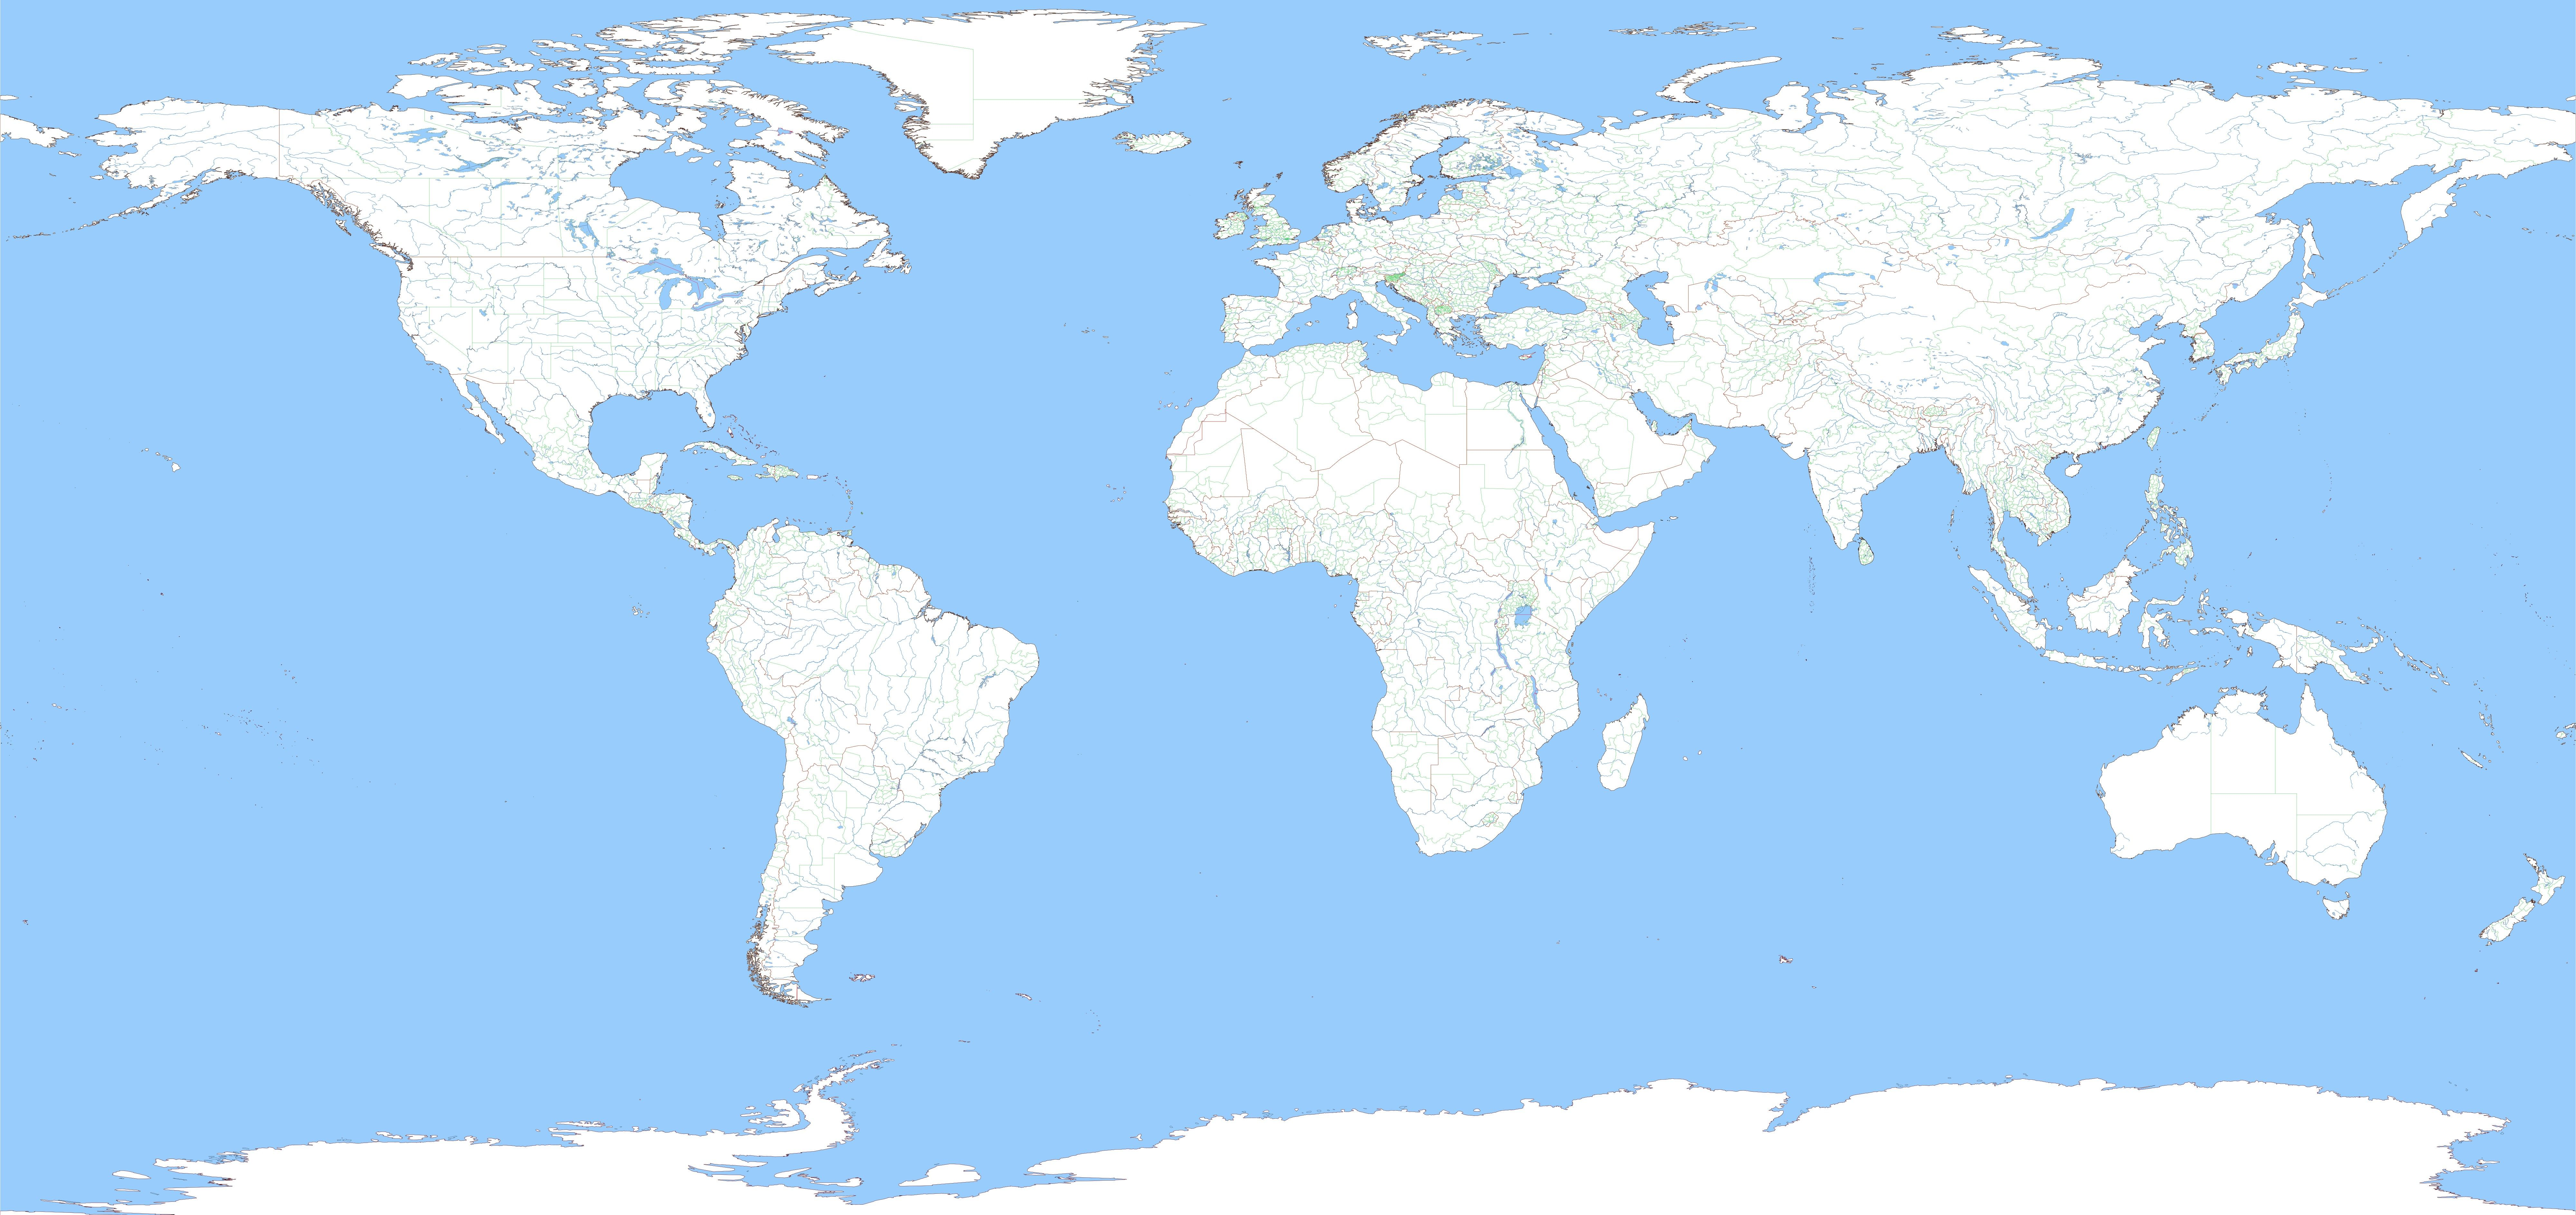 1549011 world map category free desktop backgrounds for world map 1549011 world map category free desktop backgrounds for world map freerunsca Image collections